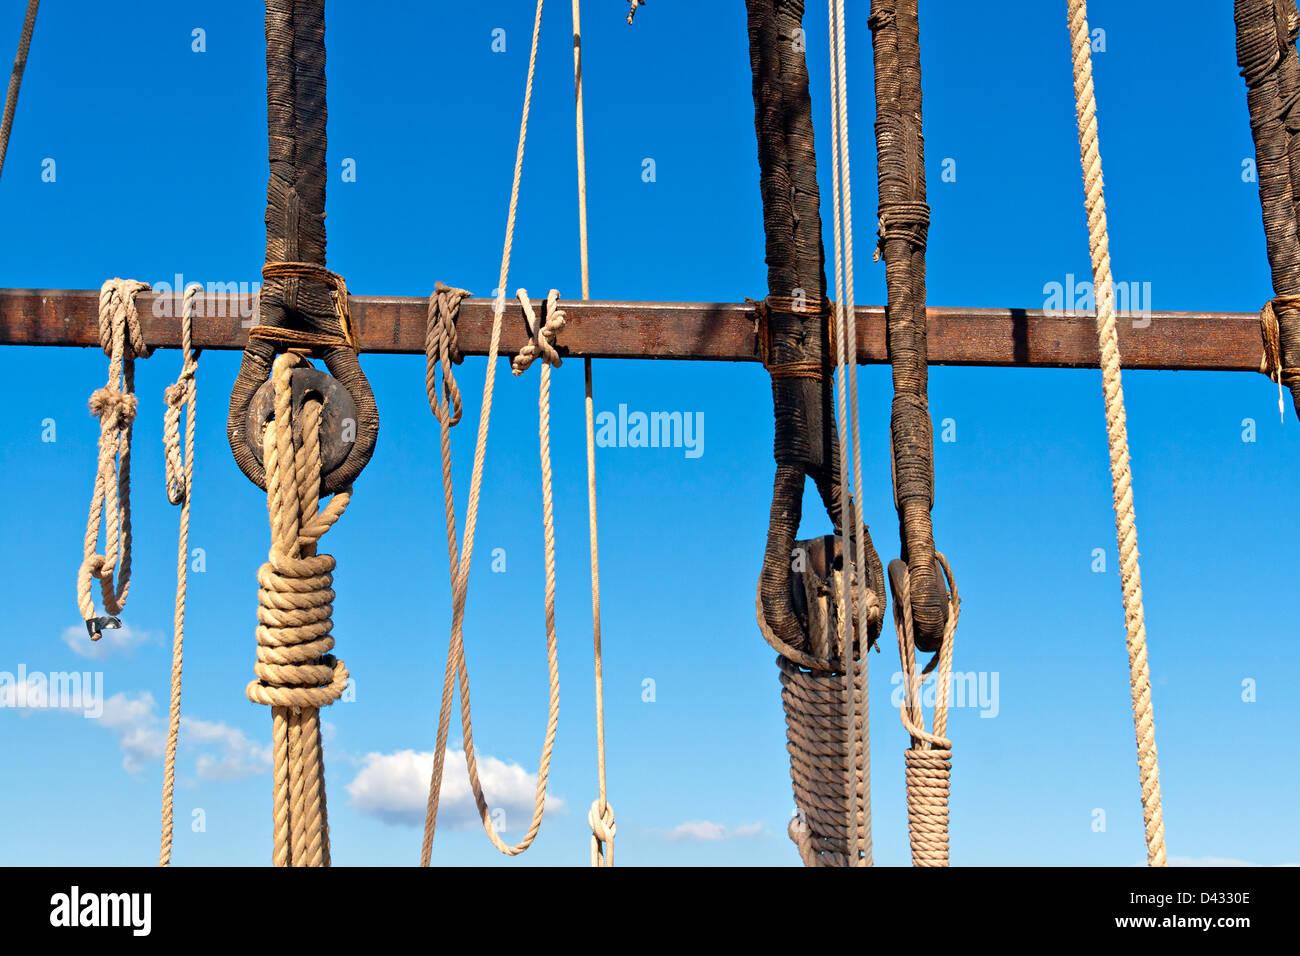 Sailboat wooden rigging, masting and ropes - Stock Image